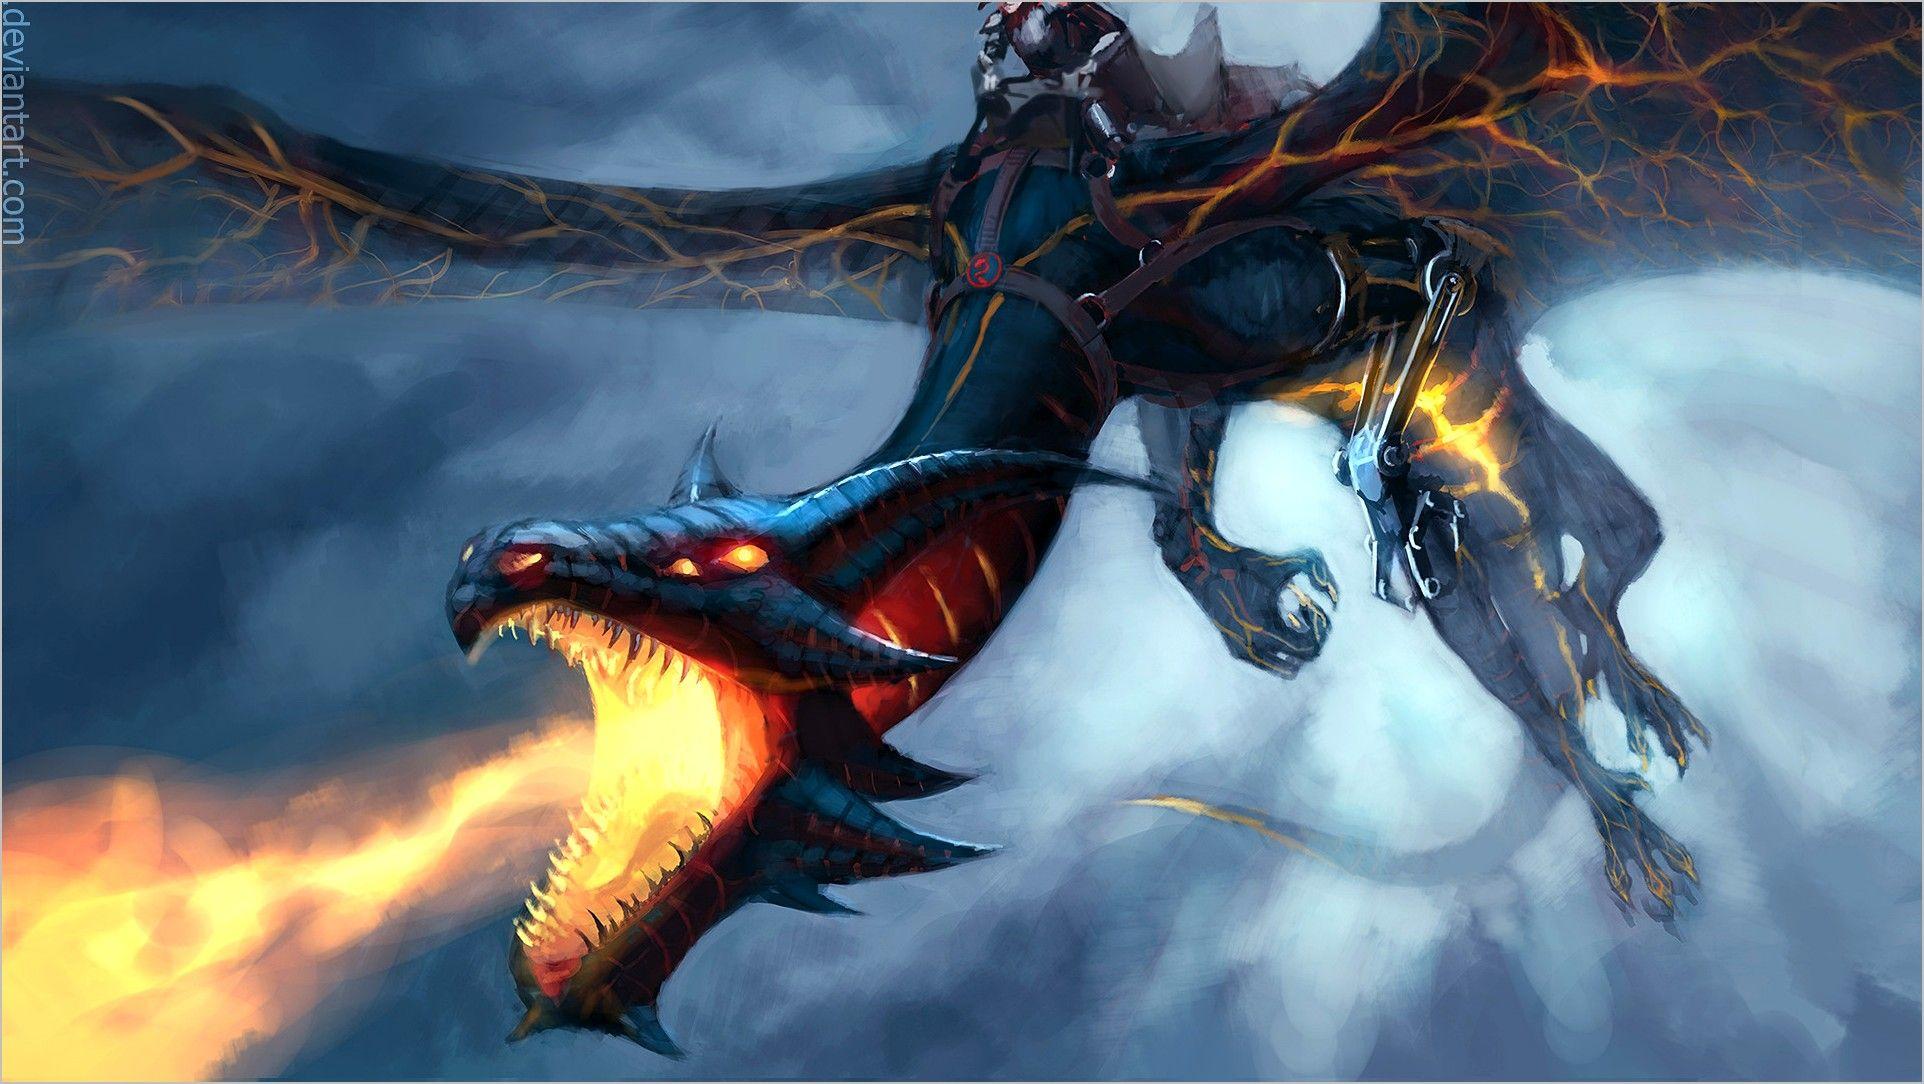 Dragon 4k Wallpaper 1920 215 1080 In 2020 Dragon Rider Dragon Art Dragon Artwork